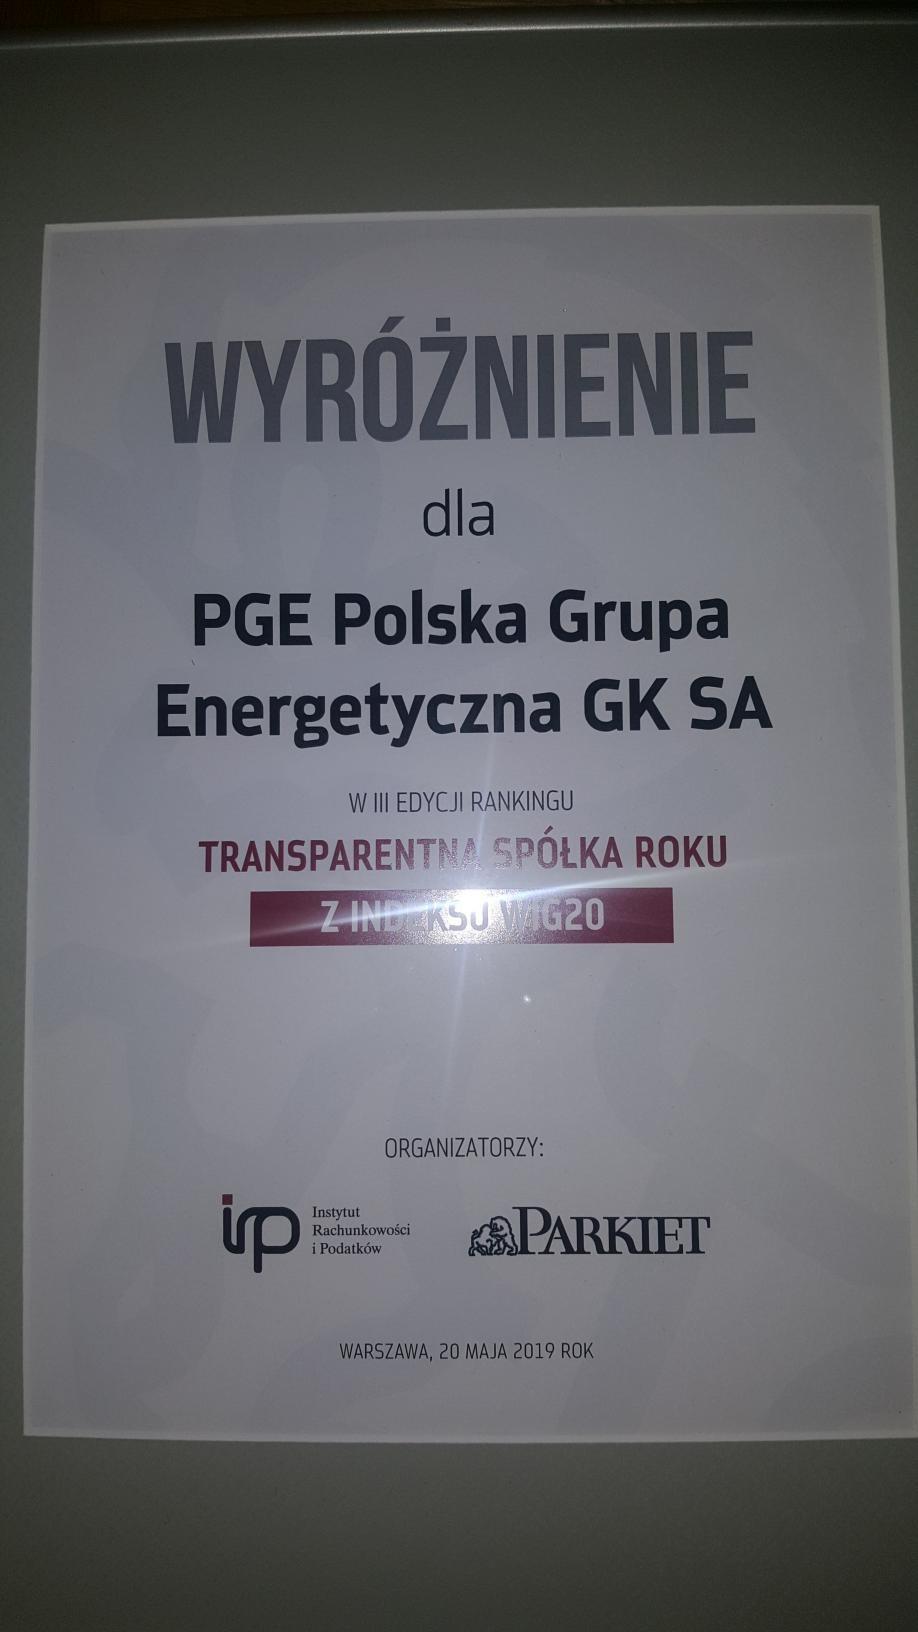 pge_transparentna_spolka.jpg